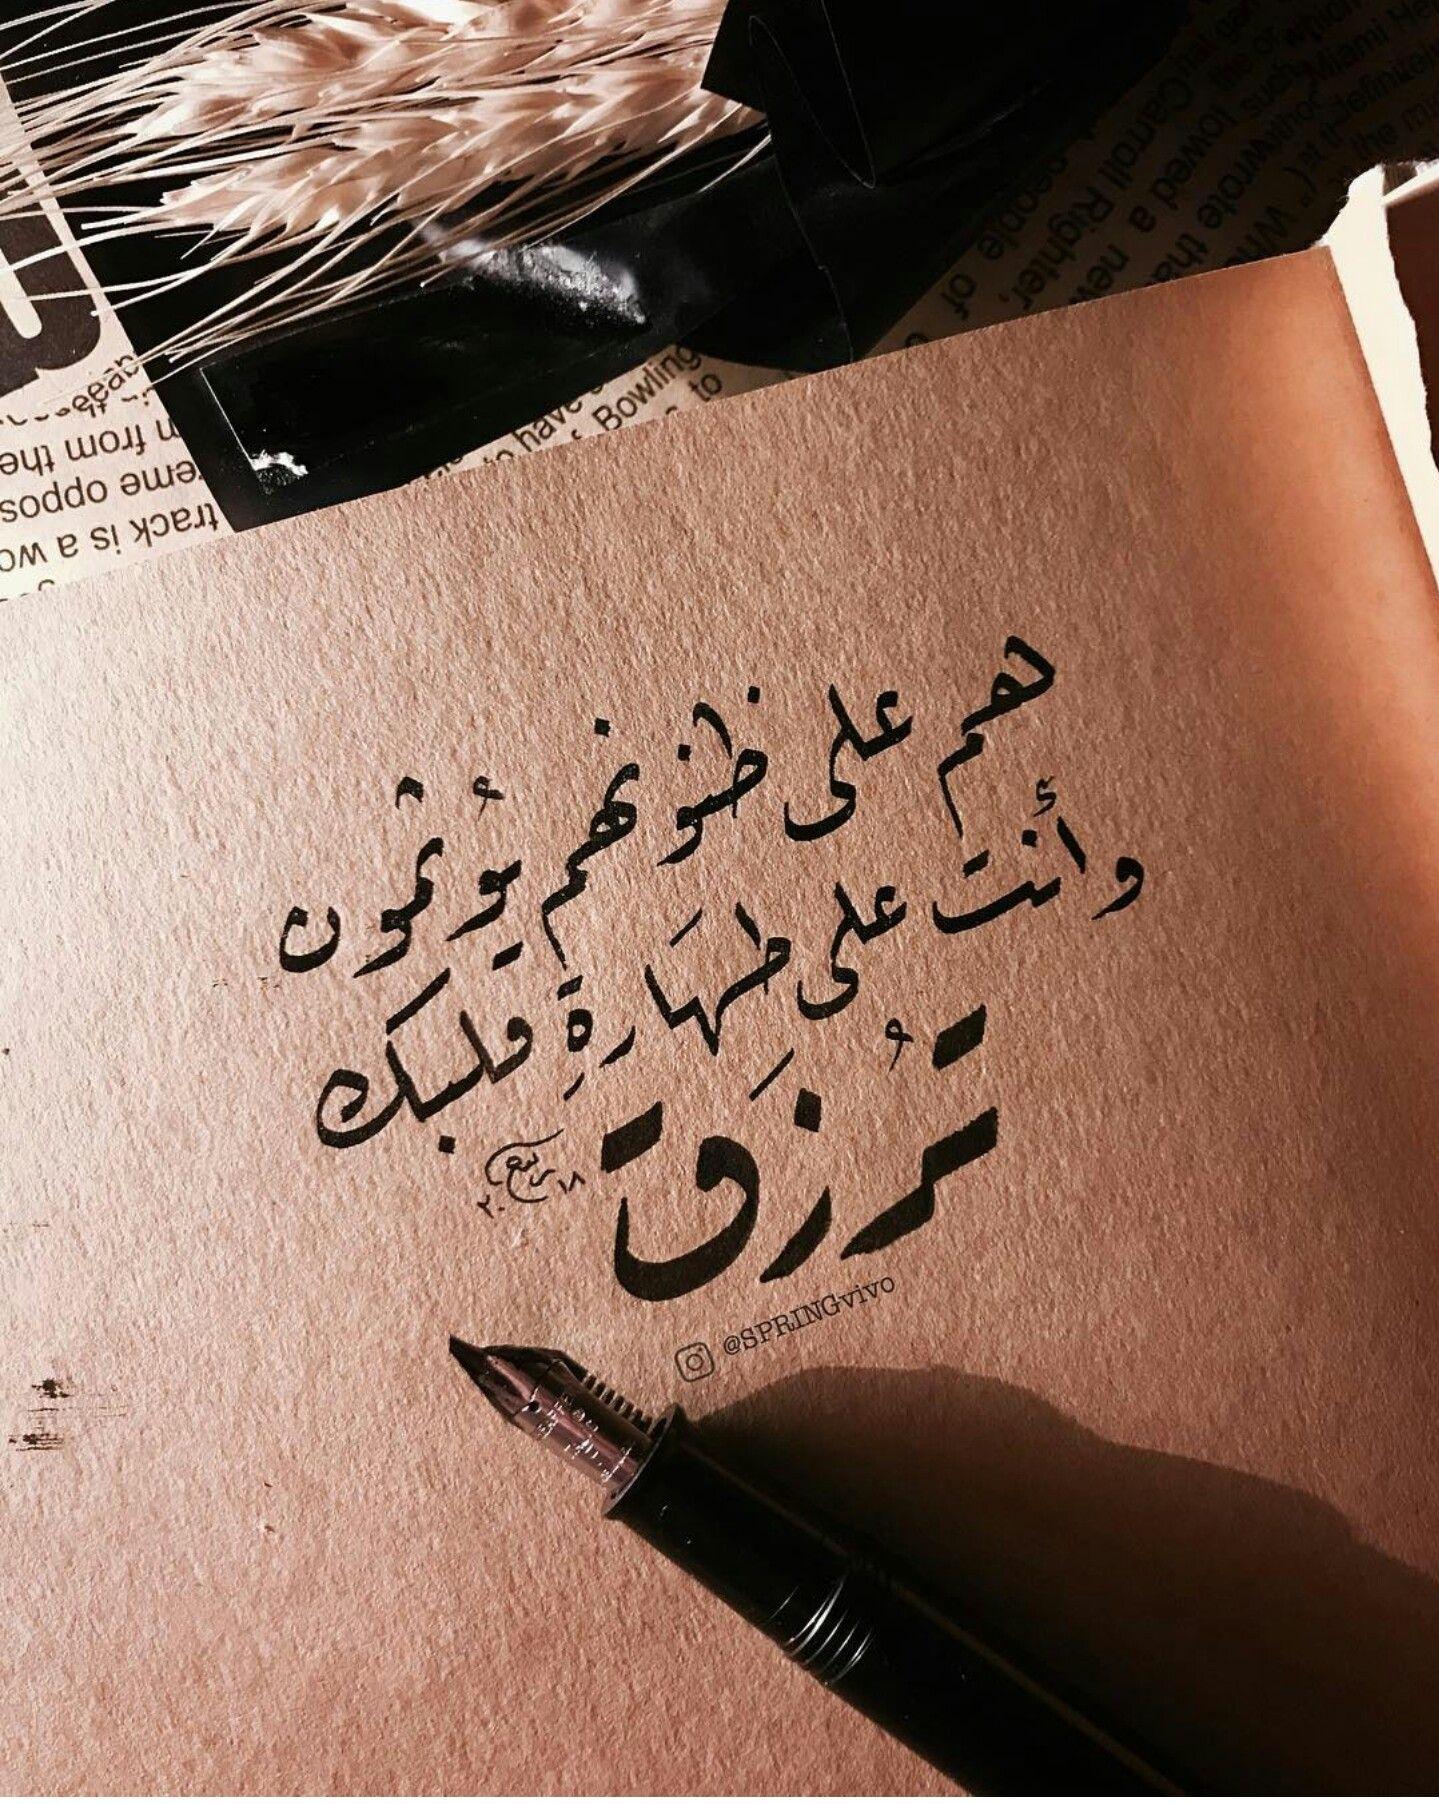 Pin By La Reina Aya On كتابه على الورق Wisdom Quotes Quotations Artists For Kids